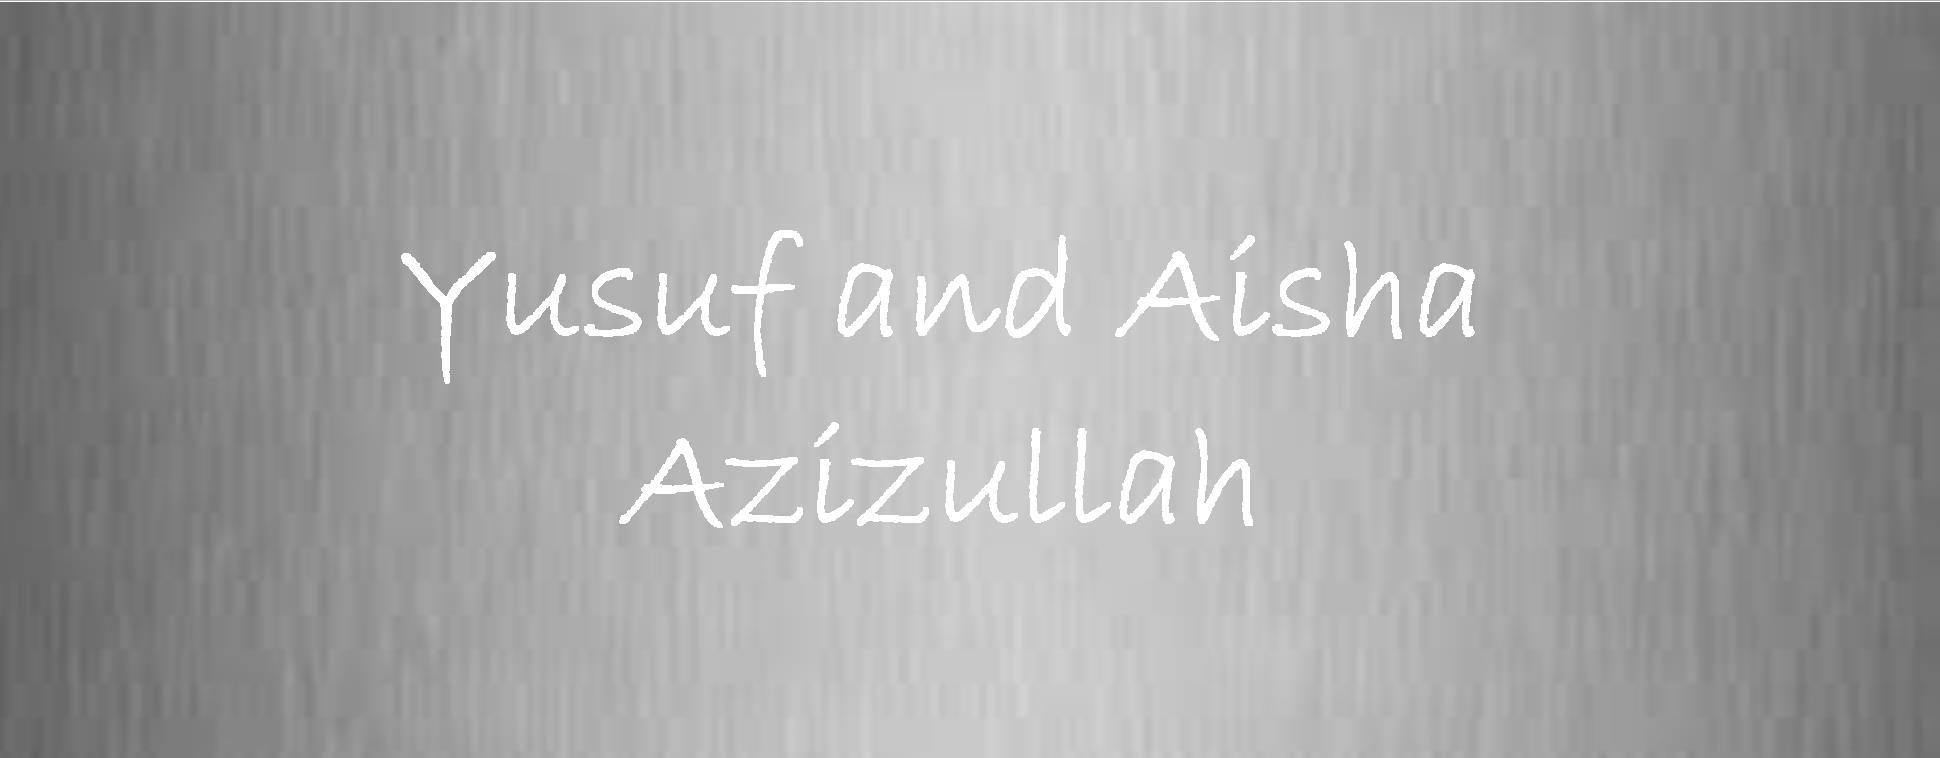 Yusuf Azizullah.jpg